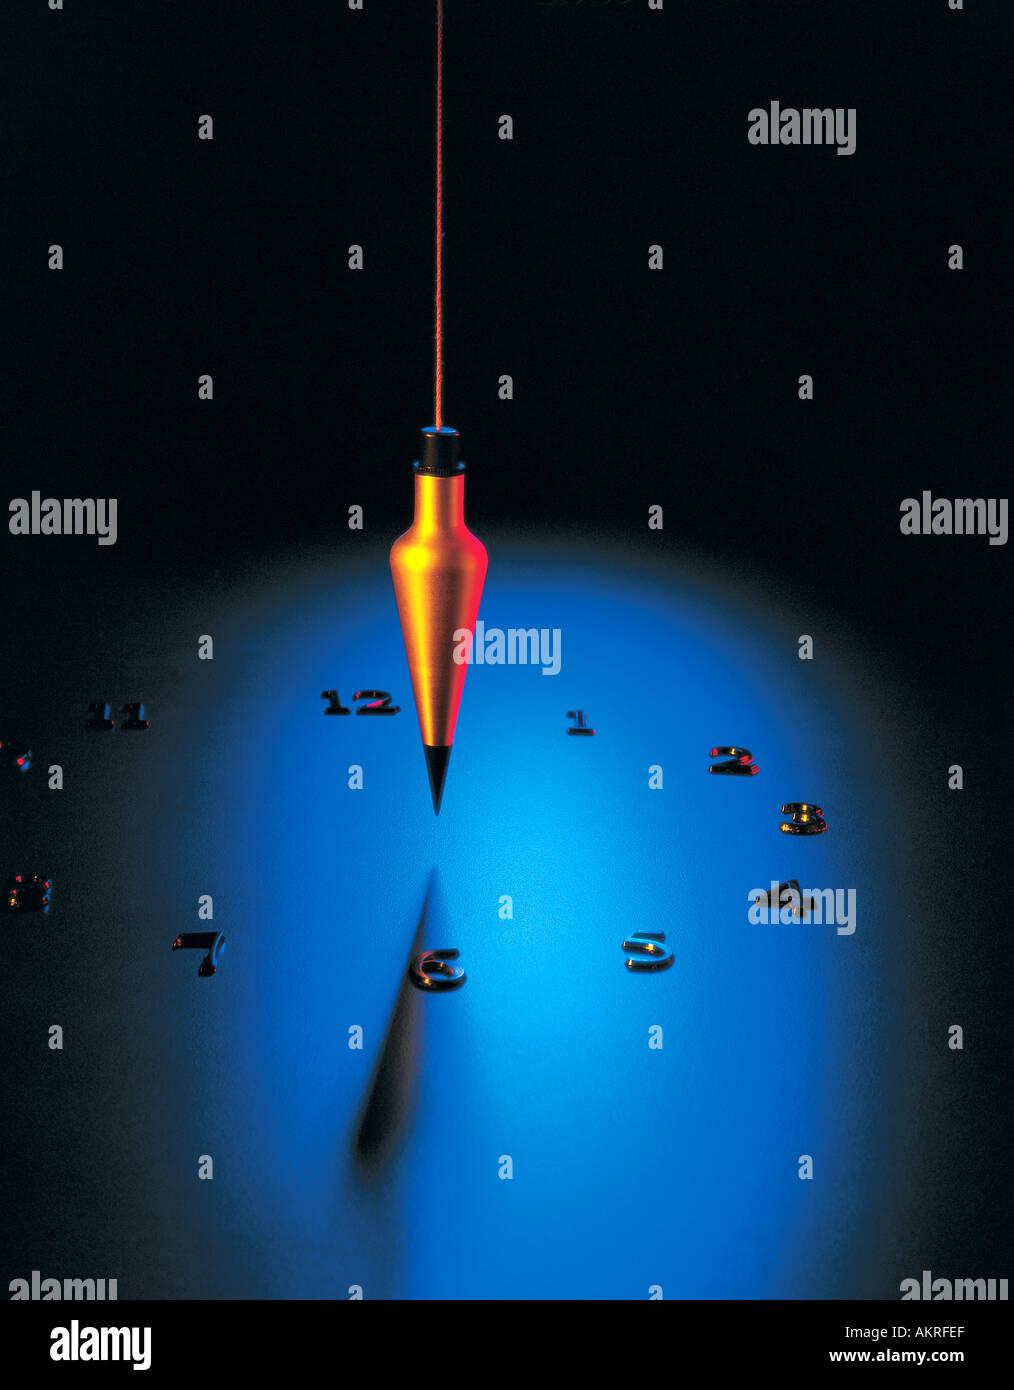 Plumbob plum bob with clock numerals on blue surface Stock Photo